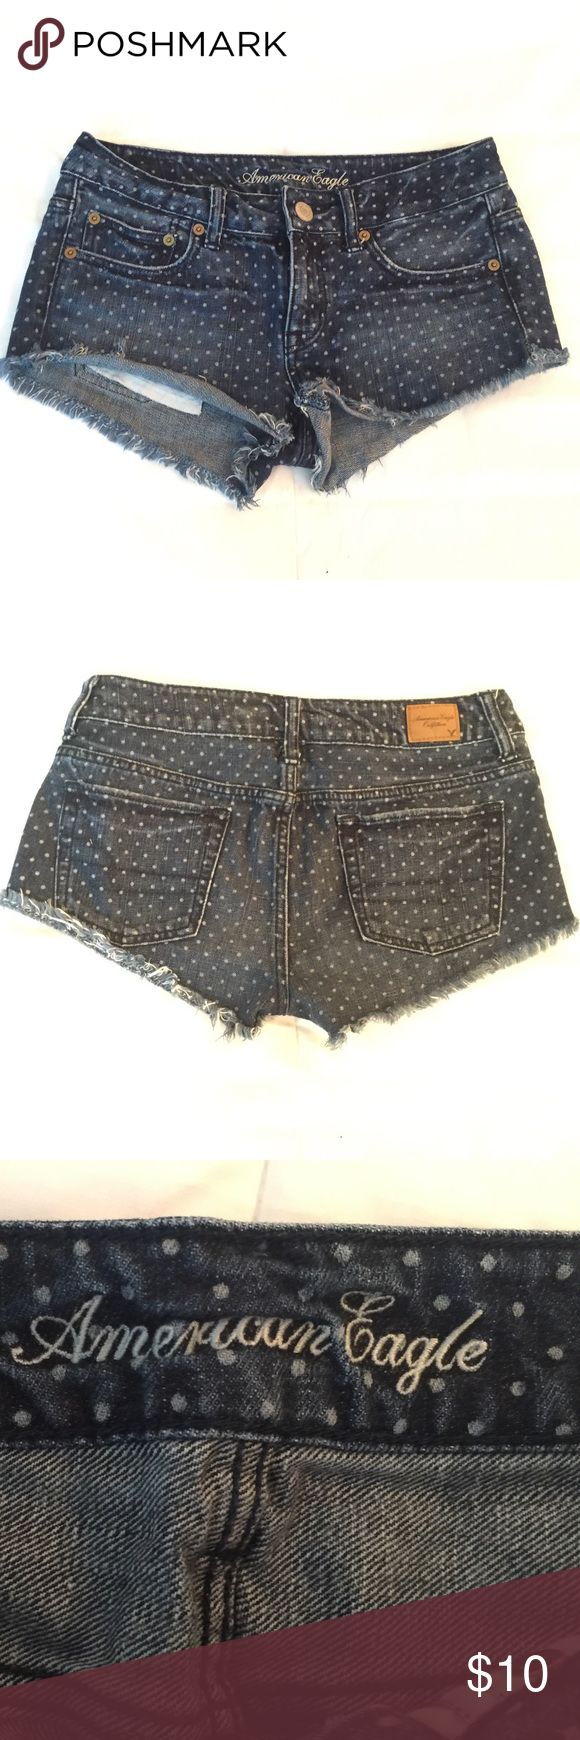 American Eagle Polka Dot Denim Shredded Shorts. Low Rise Shredded Denim Shorts, with white Polka Dots. American Eagle Outfitters Shorts Jean Shorts